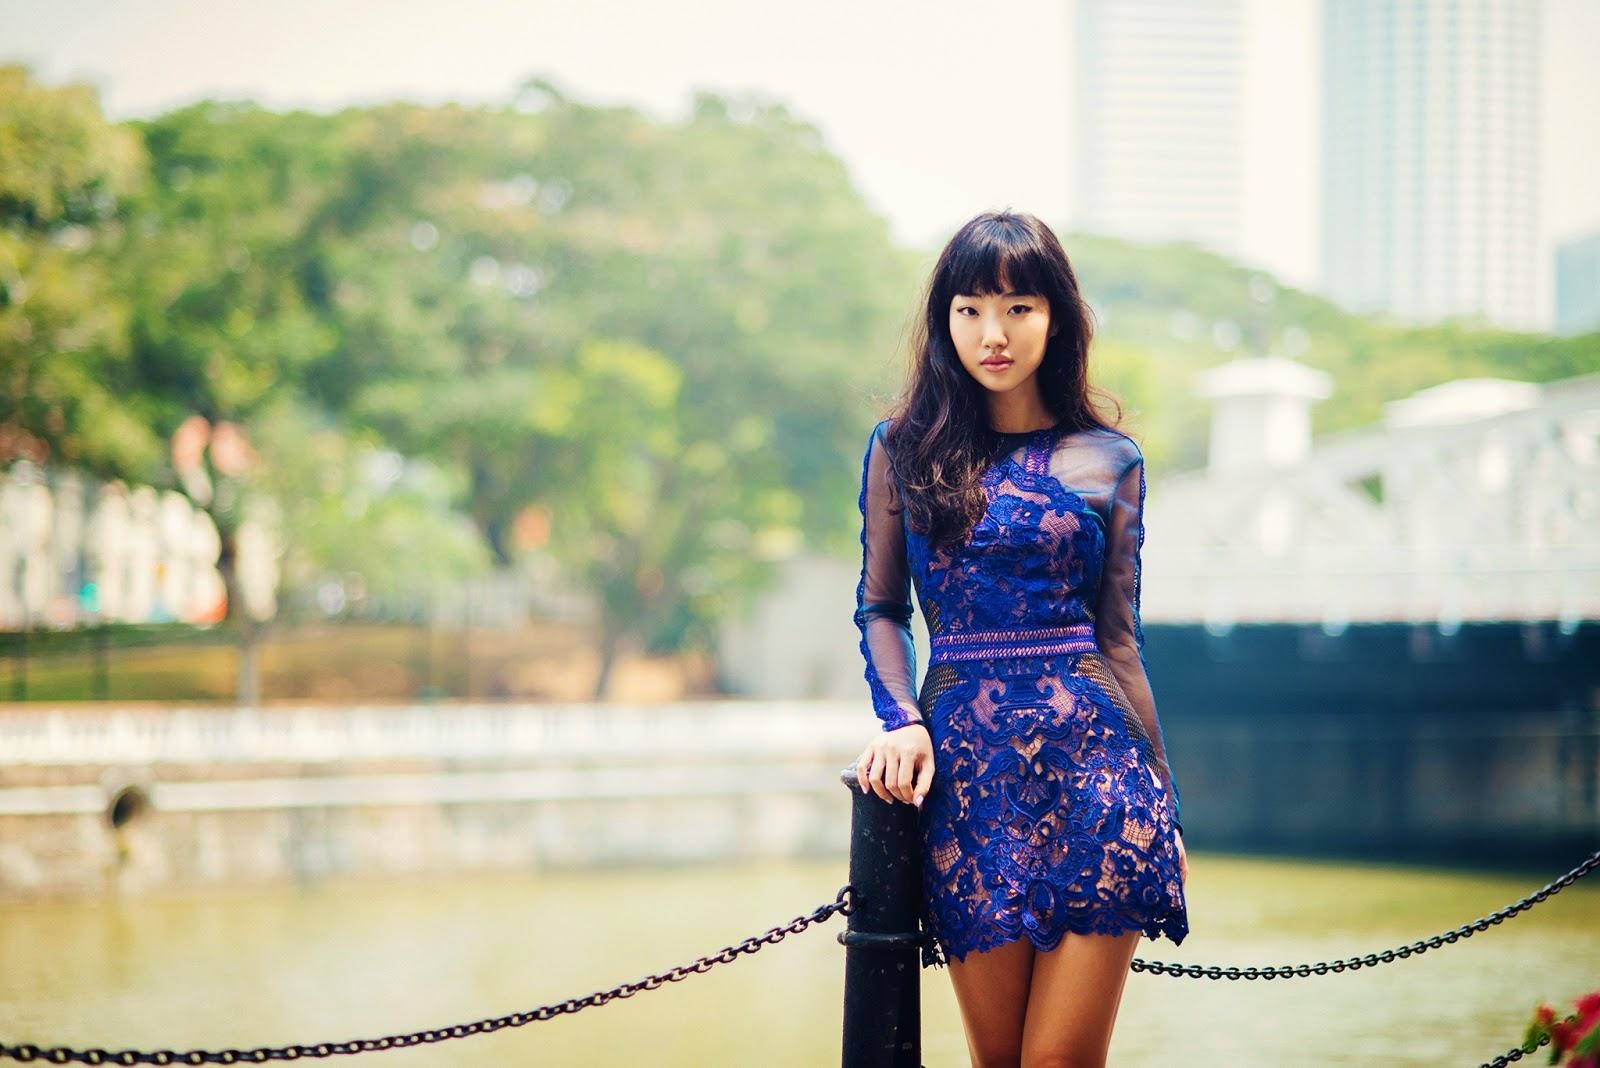 a08ddc9b2a872 Self-Portrait Studio Athanasia Dress from et-i-kit